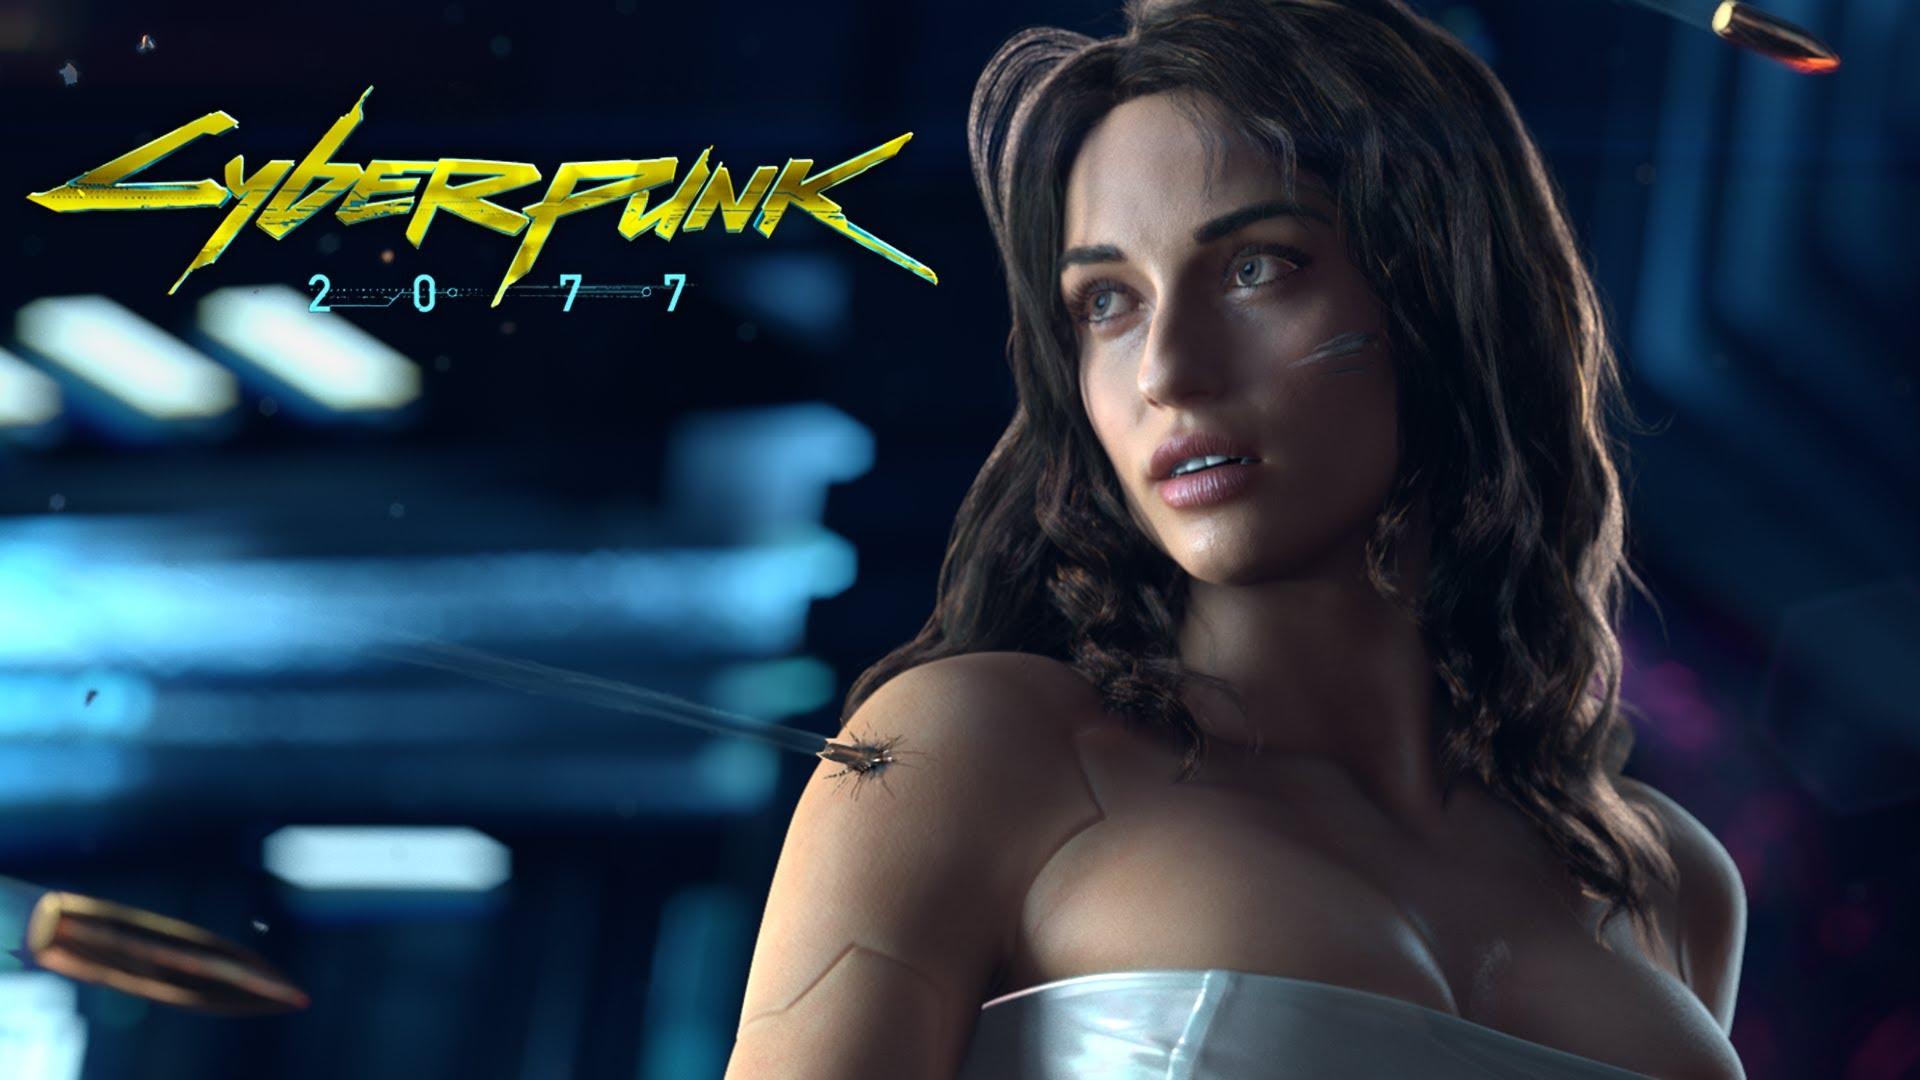 cyberpunk-2077-podria-salir-la-luz-e3-2018-frikigamers.com